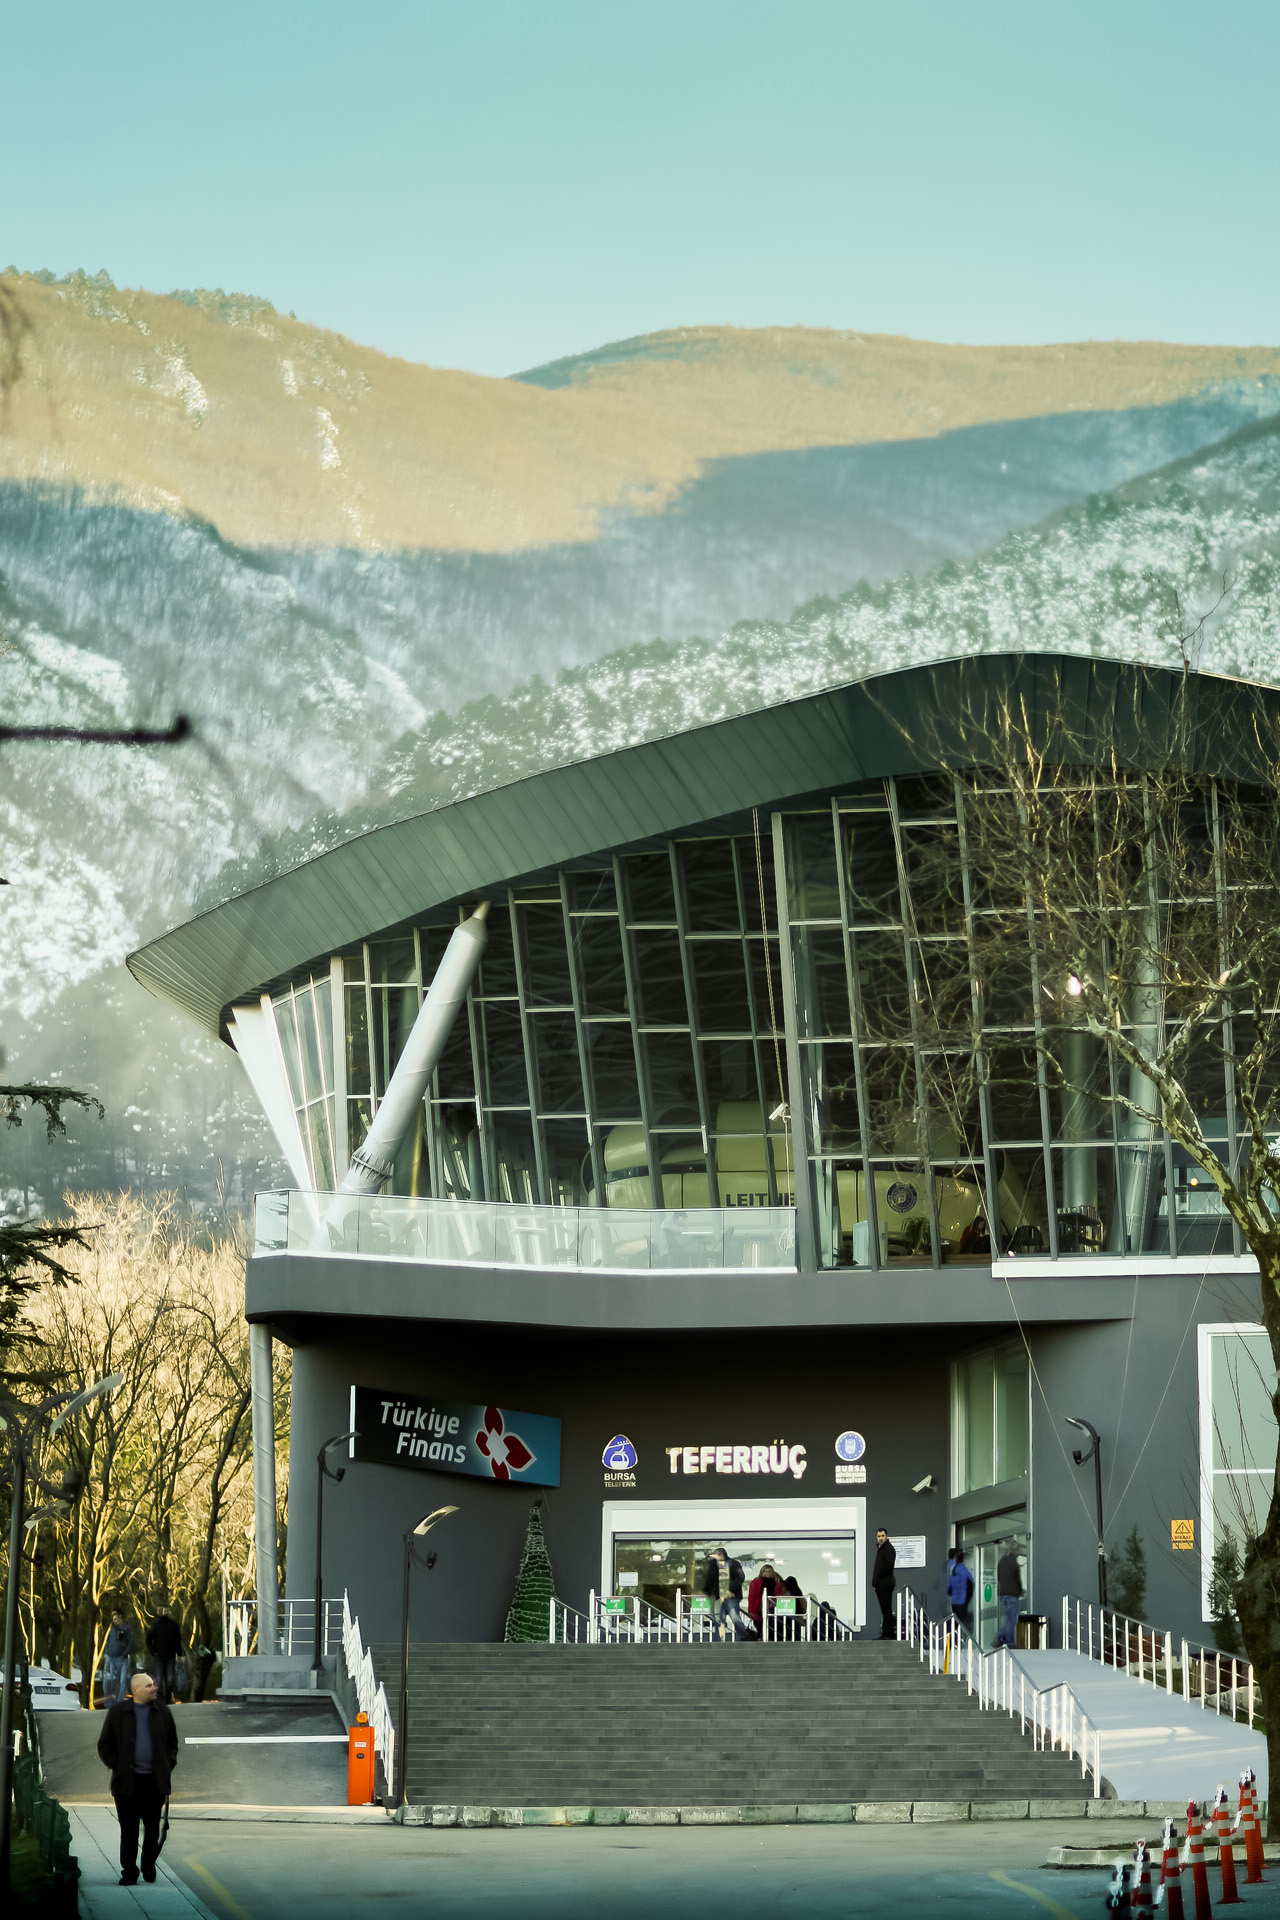 Tefferruc Cable Car Station / Teferruc Teleferik Istasyonu